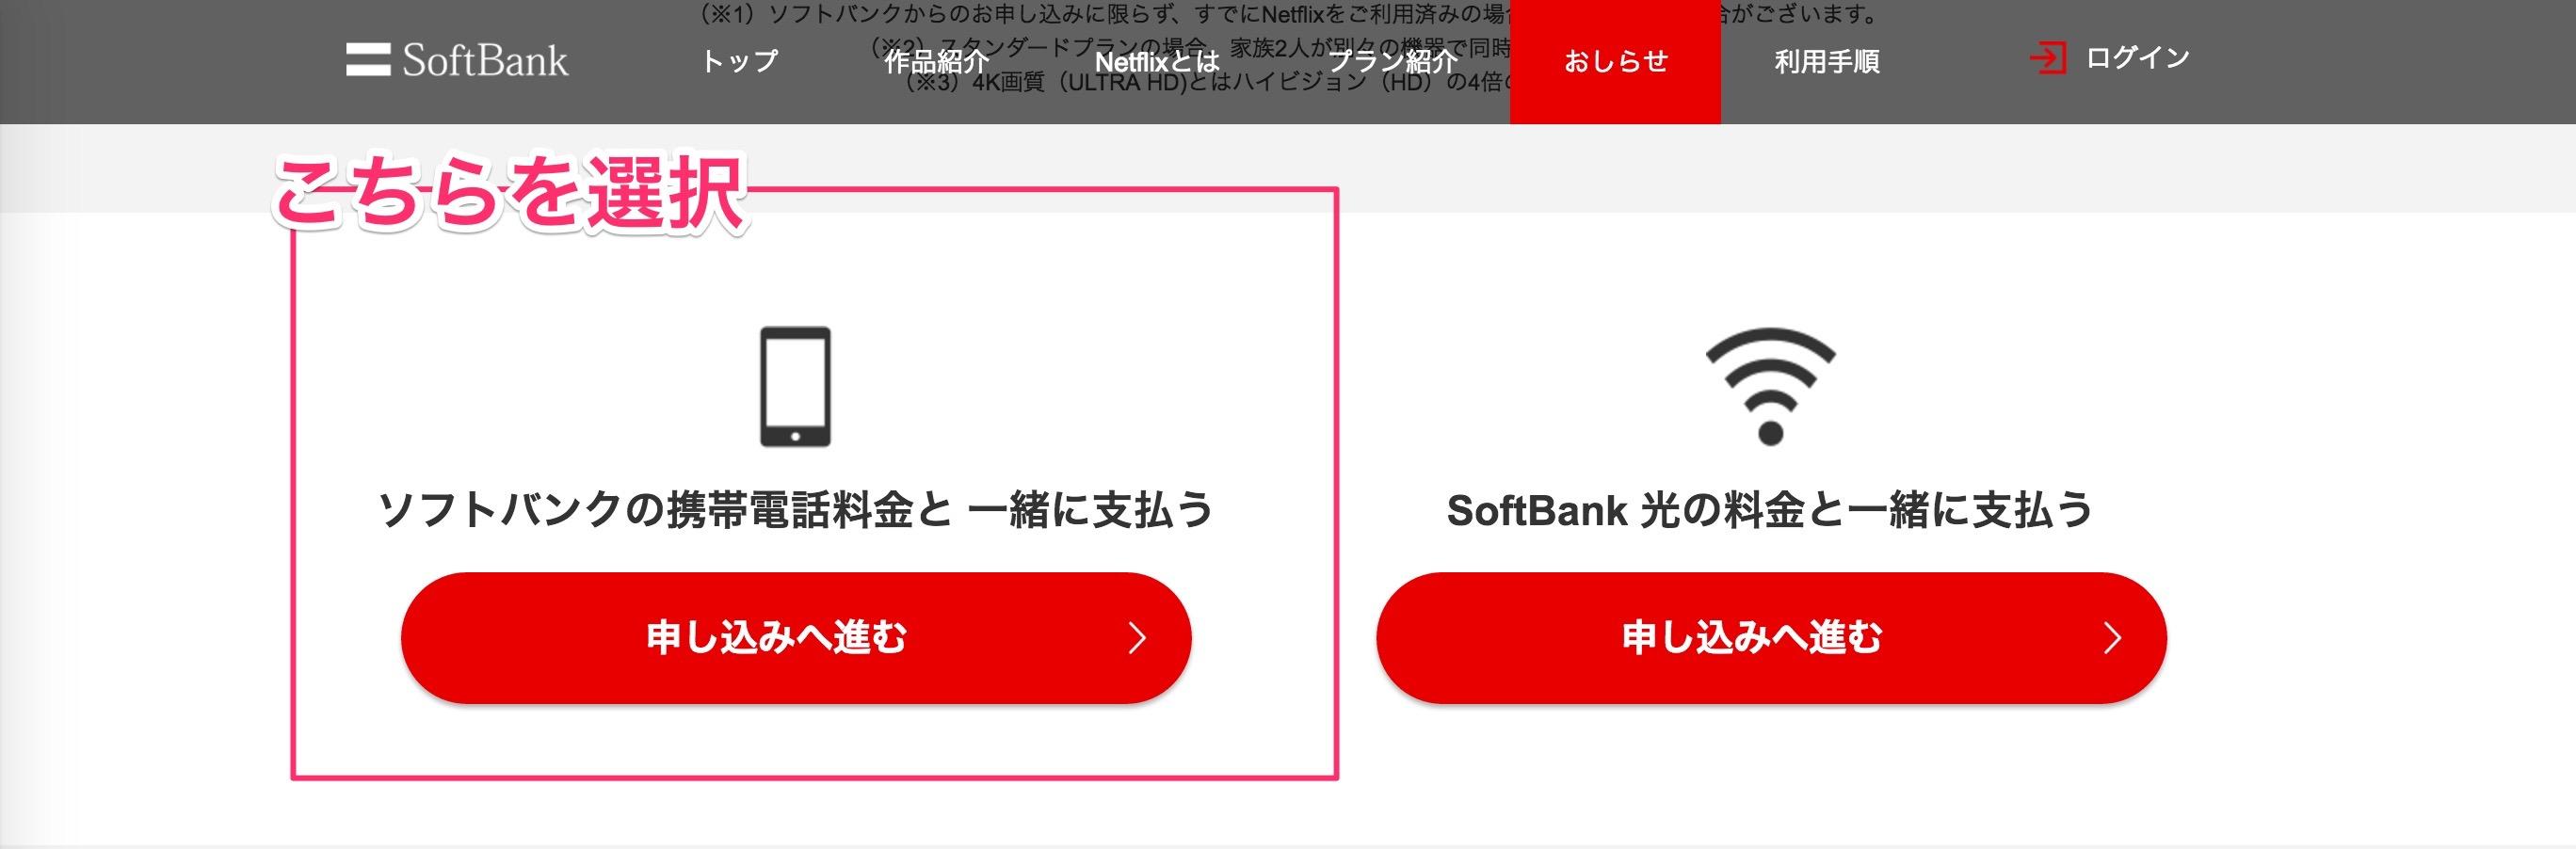 softbank支払い netflix